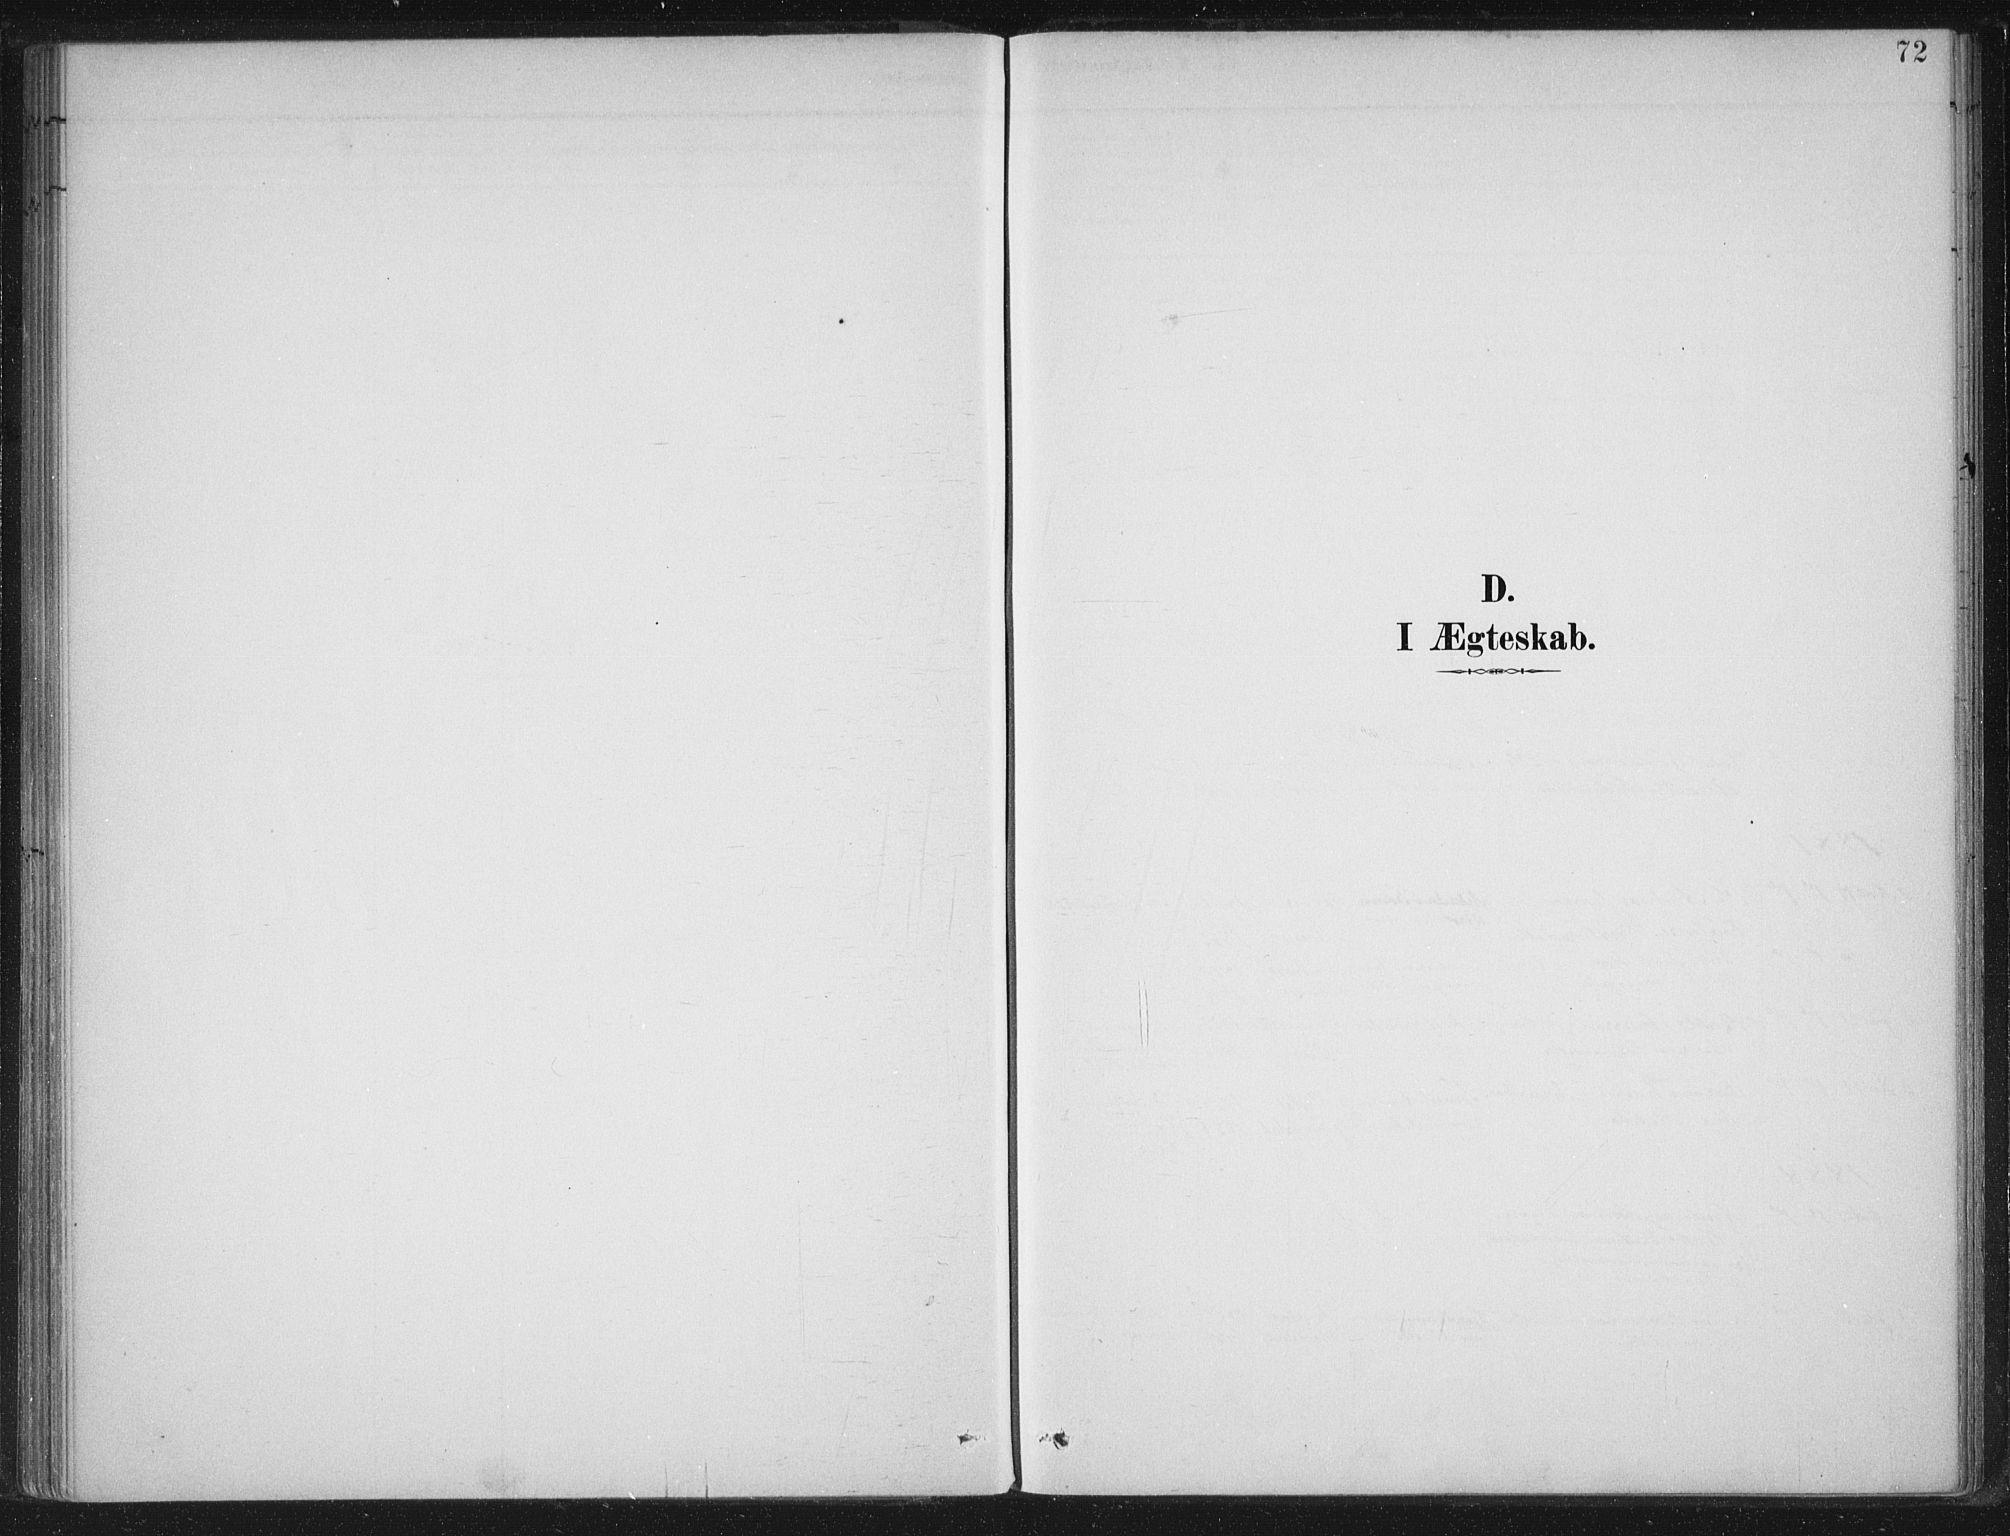 SAB, Gloppen sokneprestembete, H/Haa/Haad/L0001: Ministerialbok nr. D  1, 1885-1910, s. 72